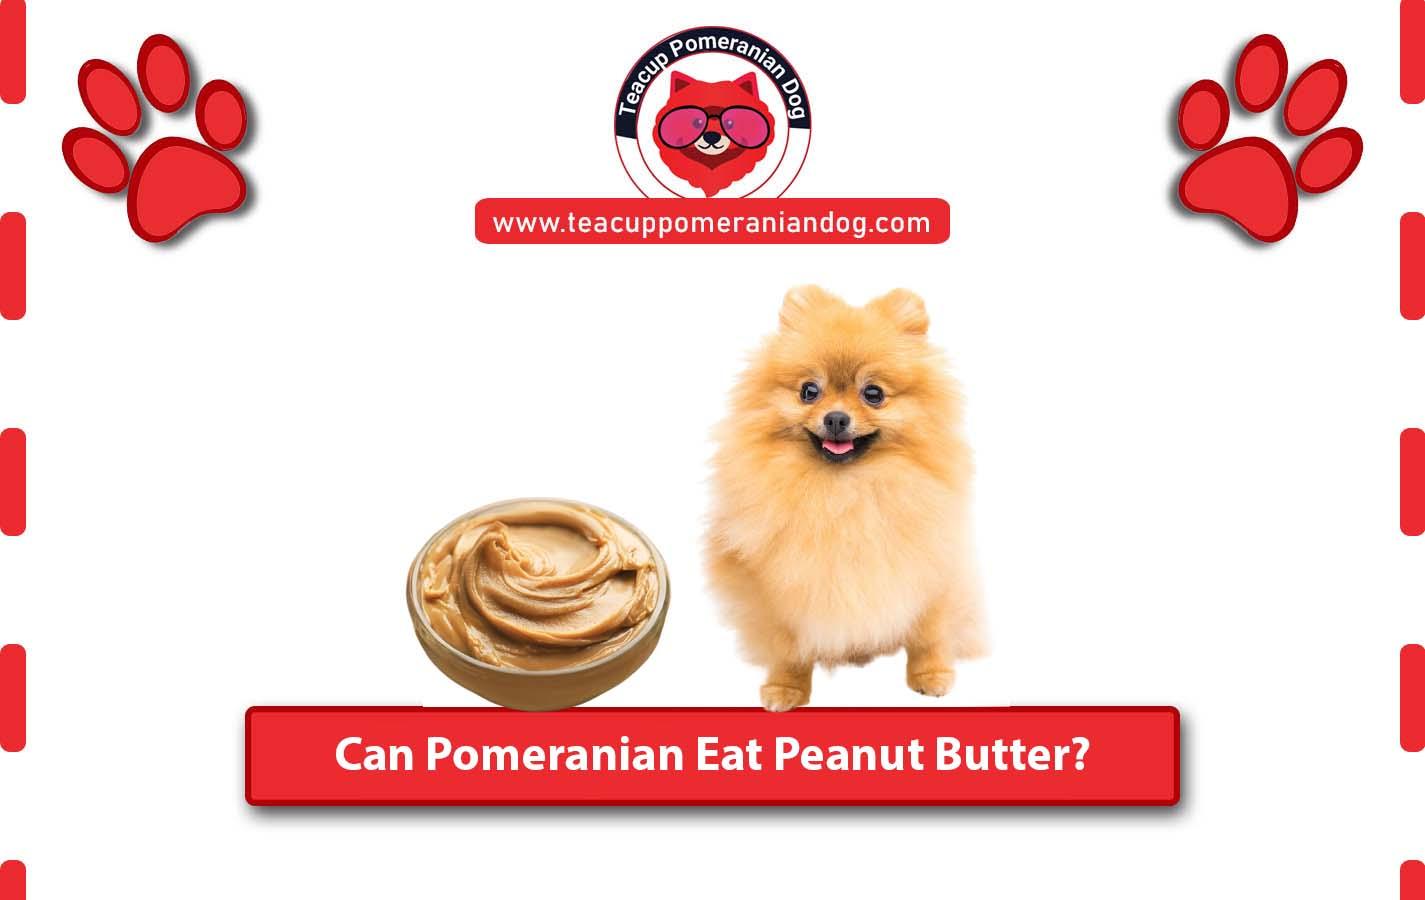 Can Pomeranian Eat Peanut Butter